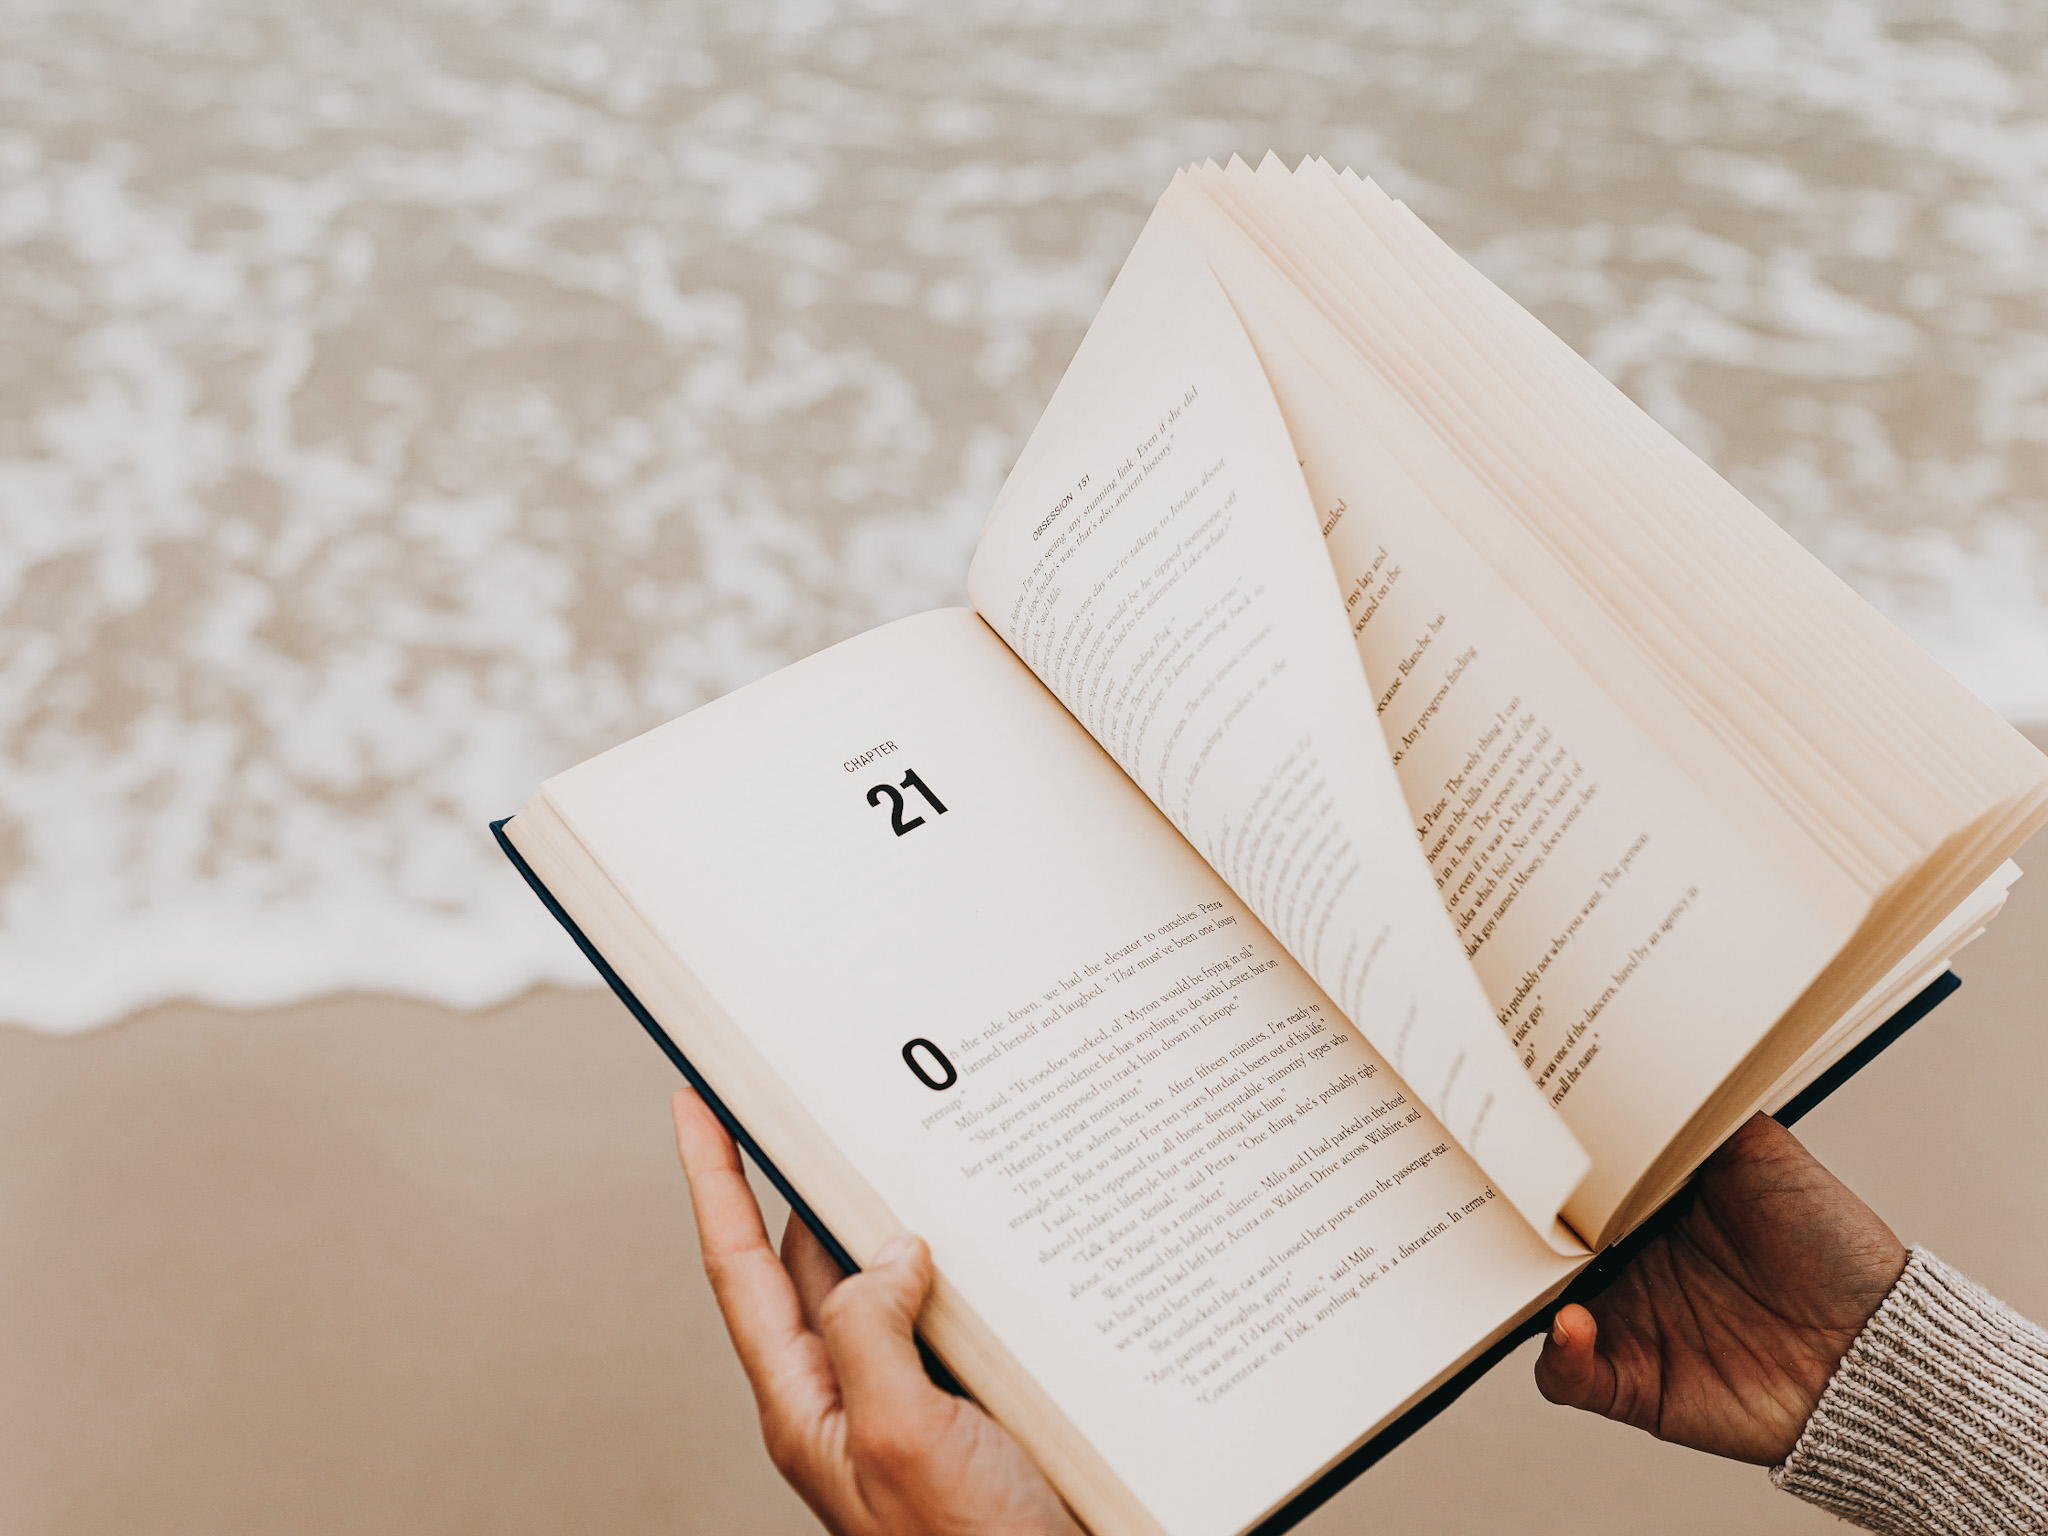 Andreea-Prodan-Summer-book-list LIFESTYLE